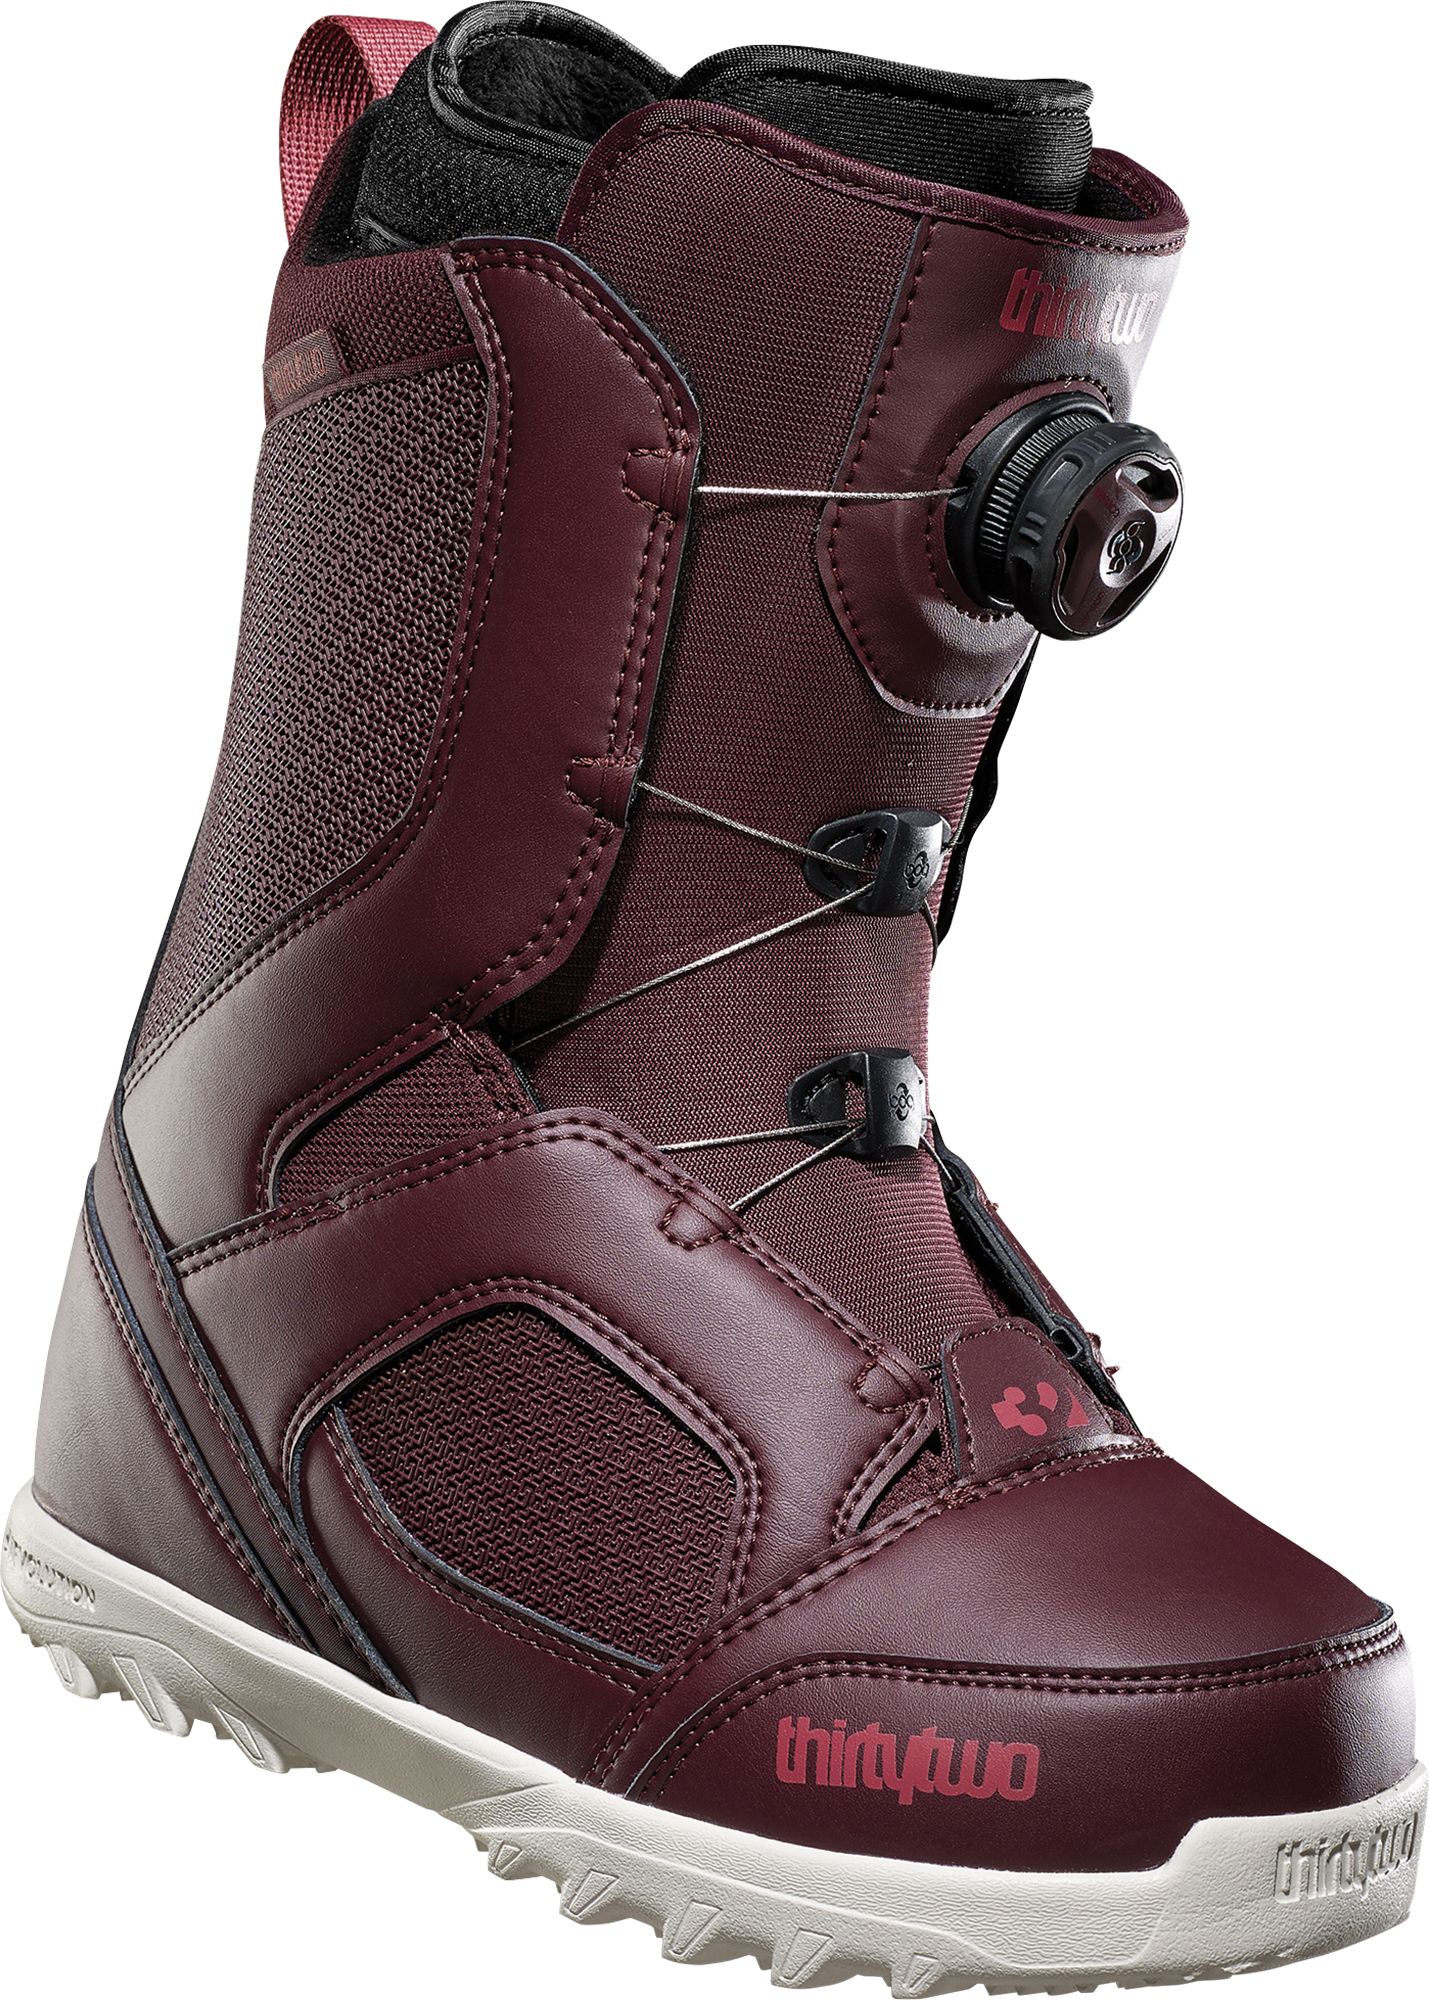 ThirtyTwo Сноубордические ботинки женские ThirtyTwo Stw Boa '18, размер 39 цена